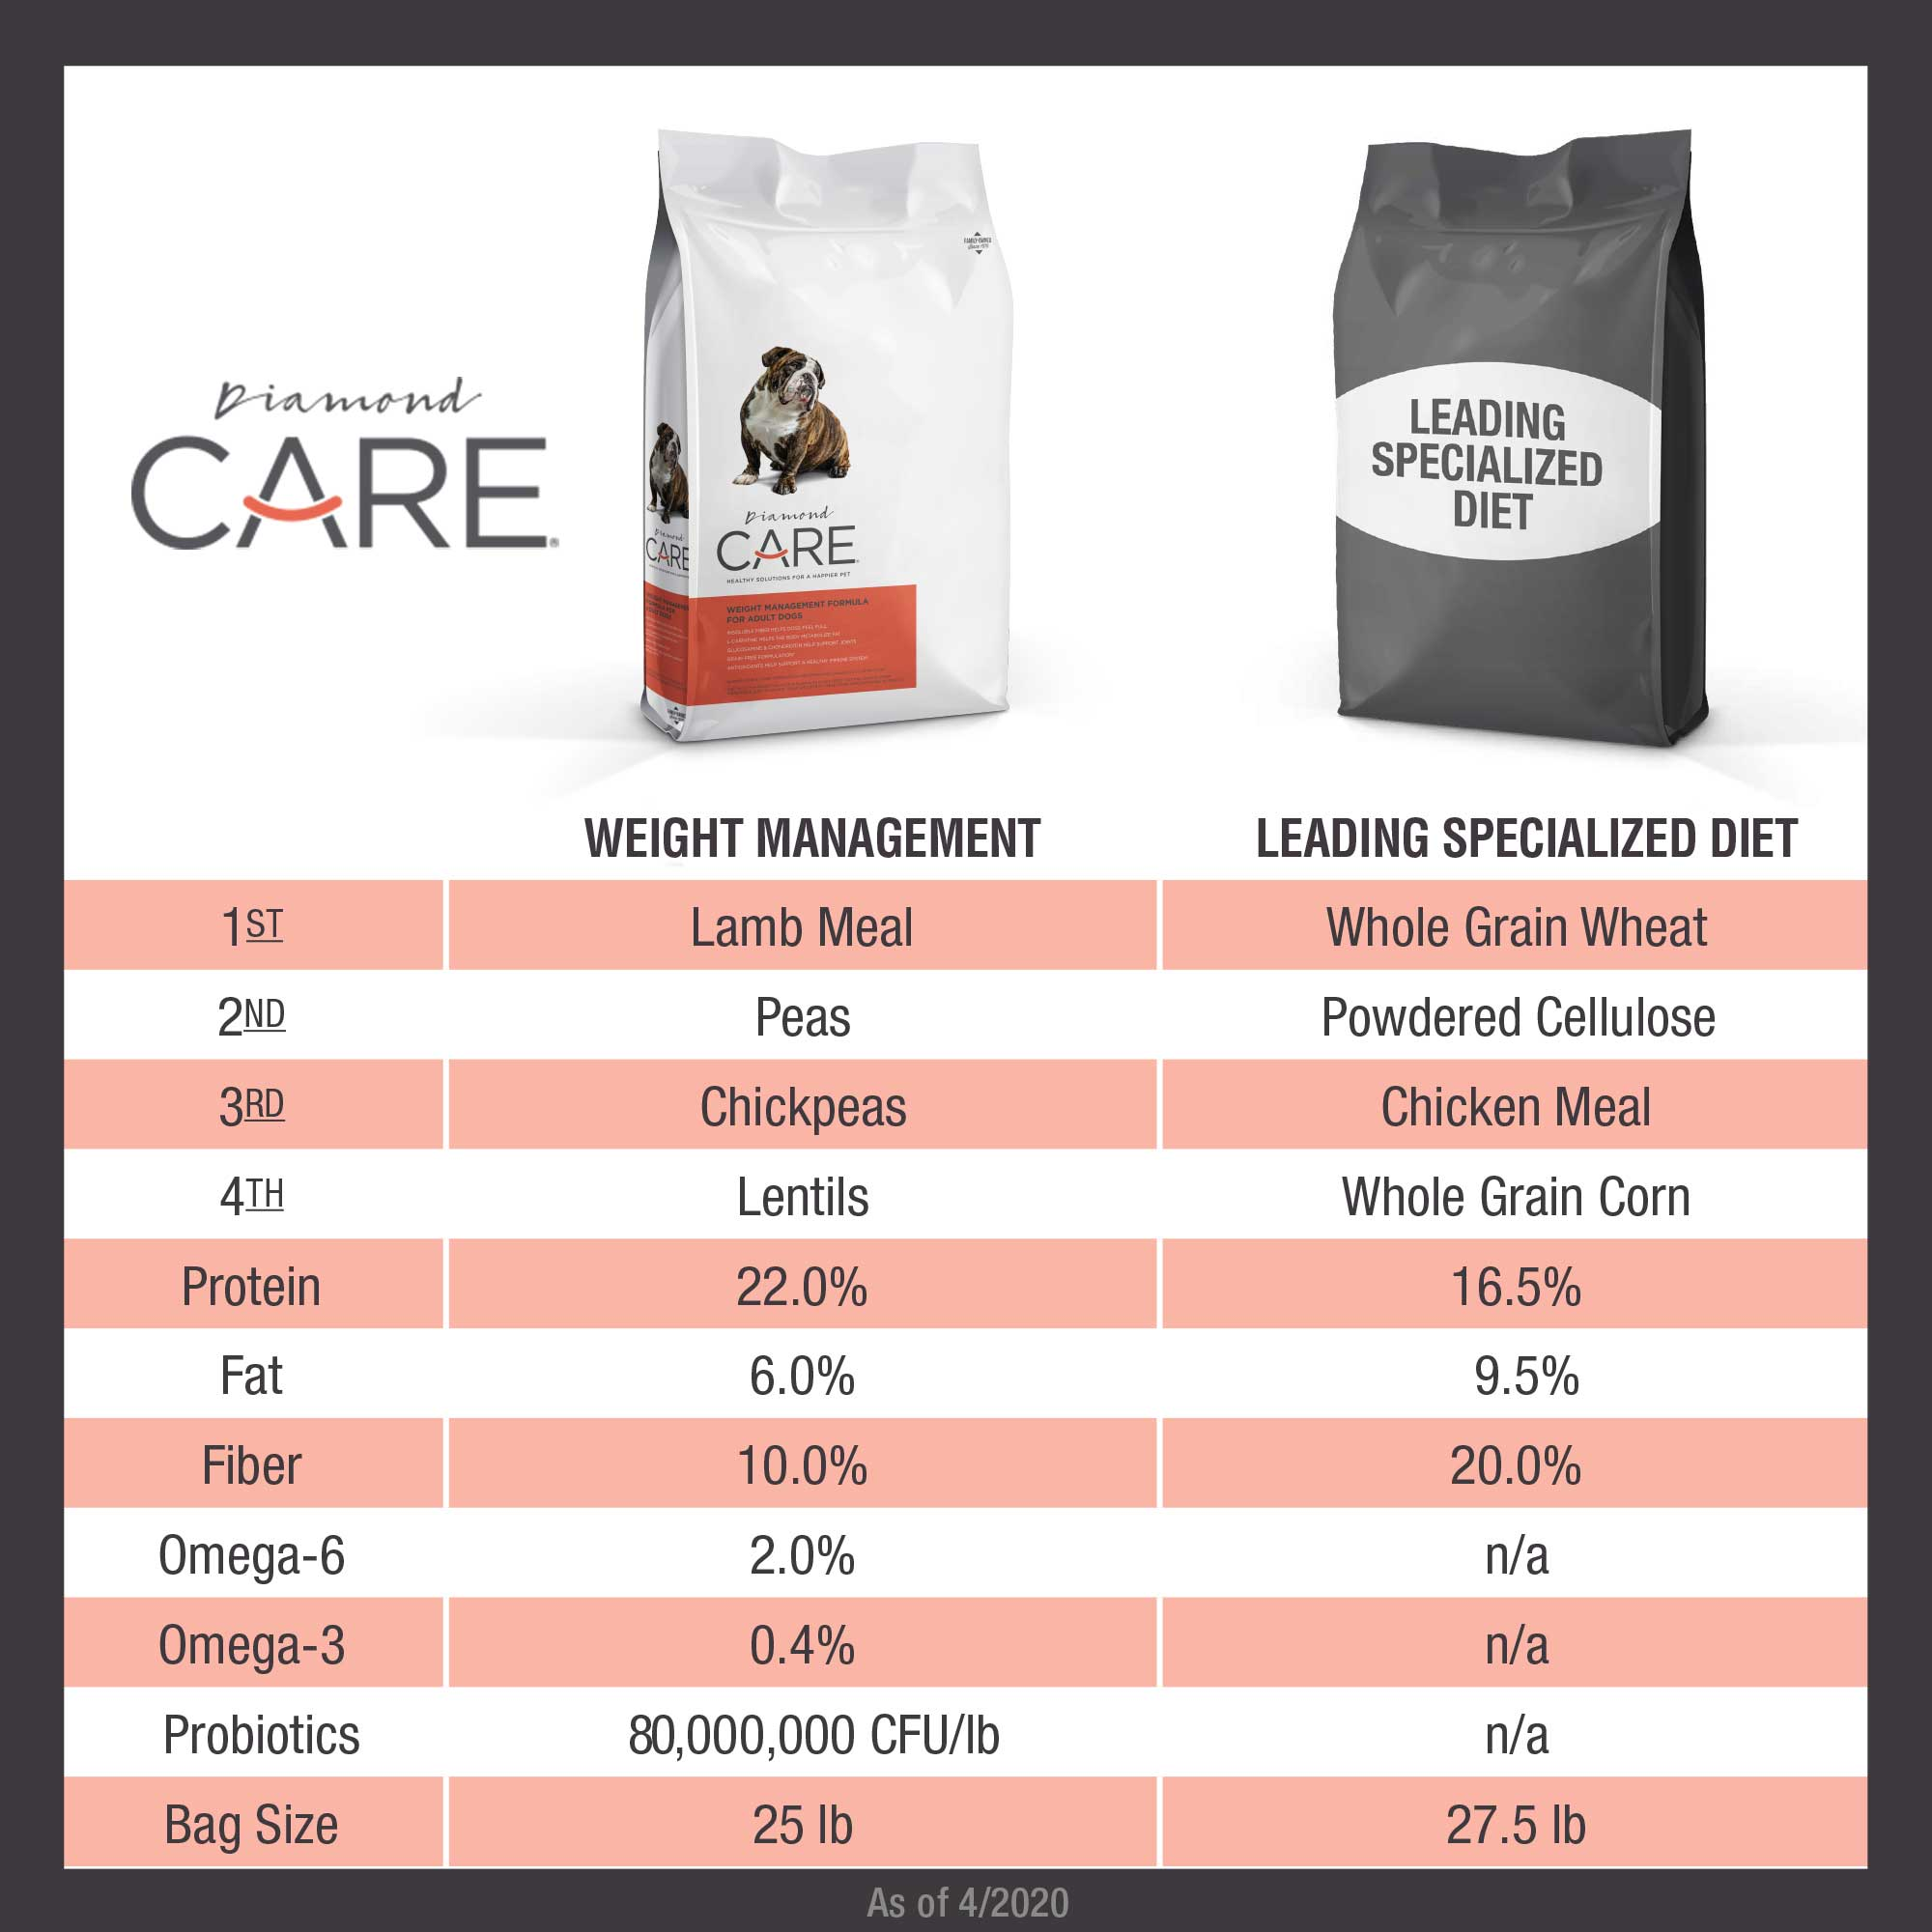 Diamond CARE Weight Management Formula for Adult Dogs comparison chart | Diamond Pet Foods